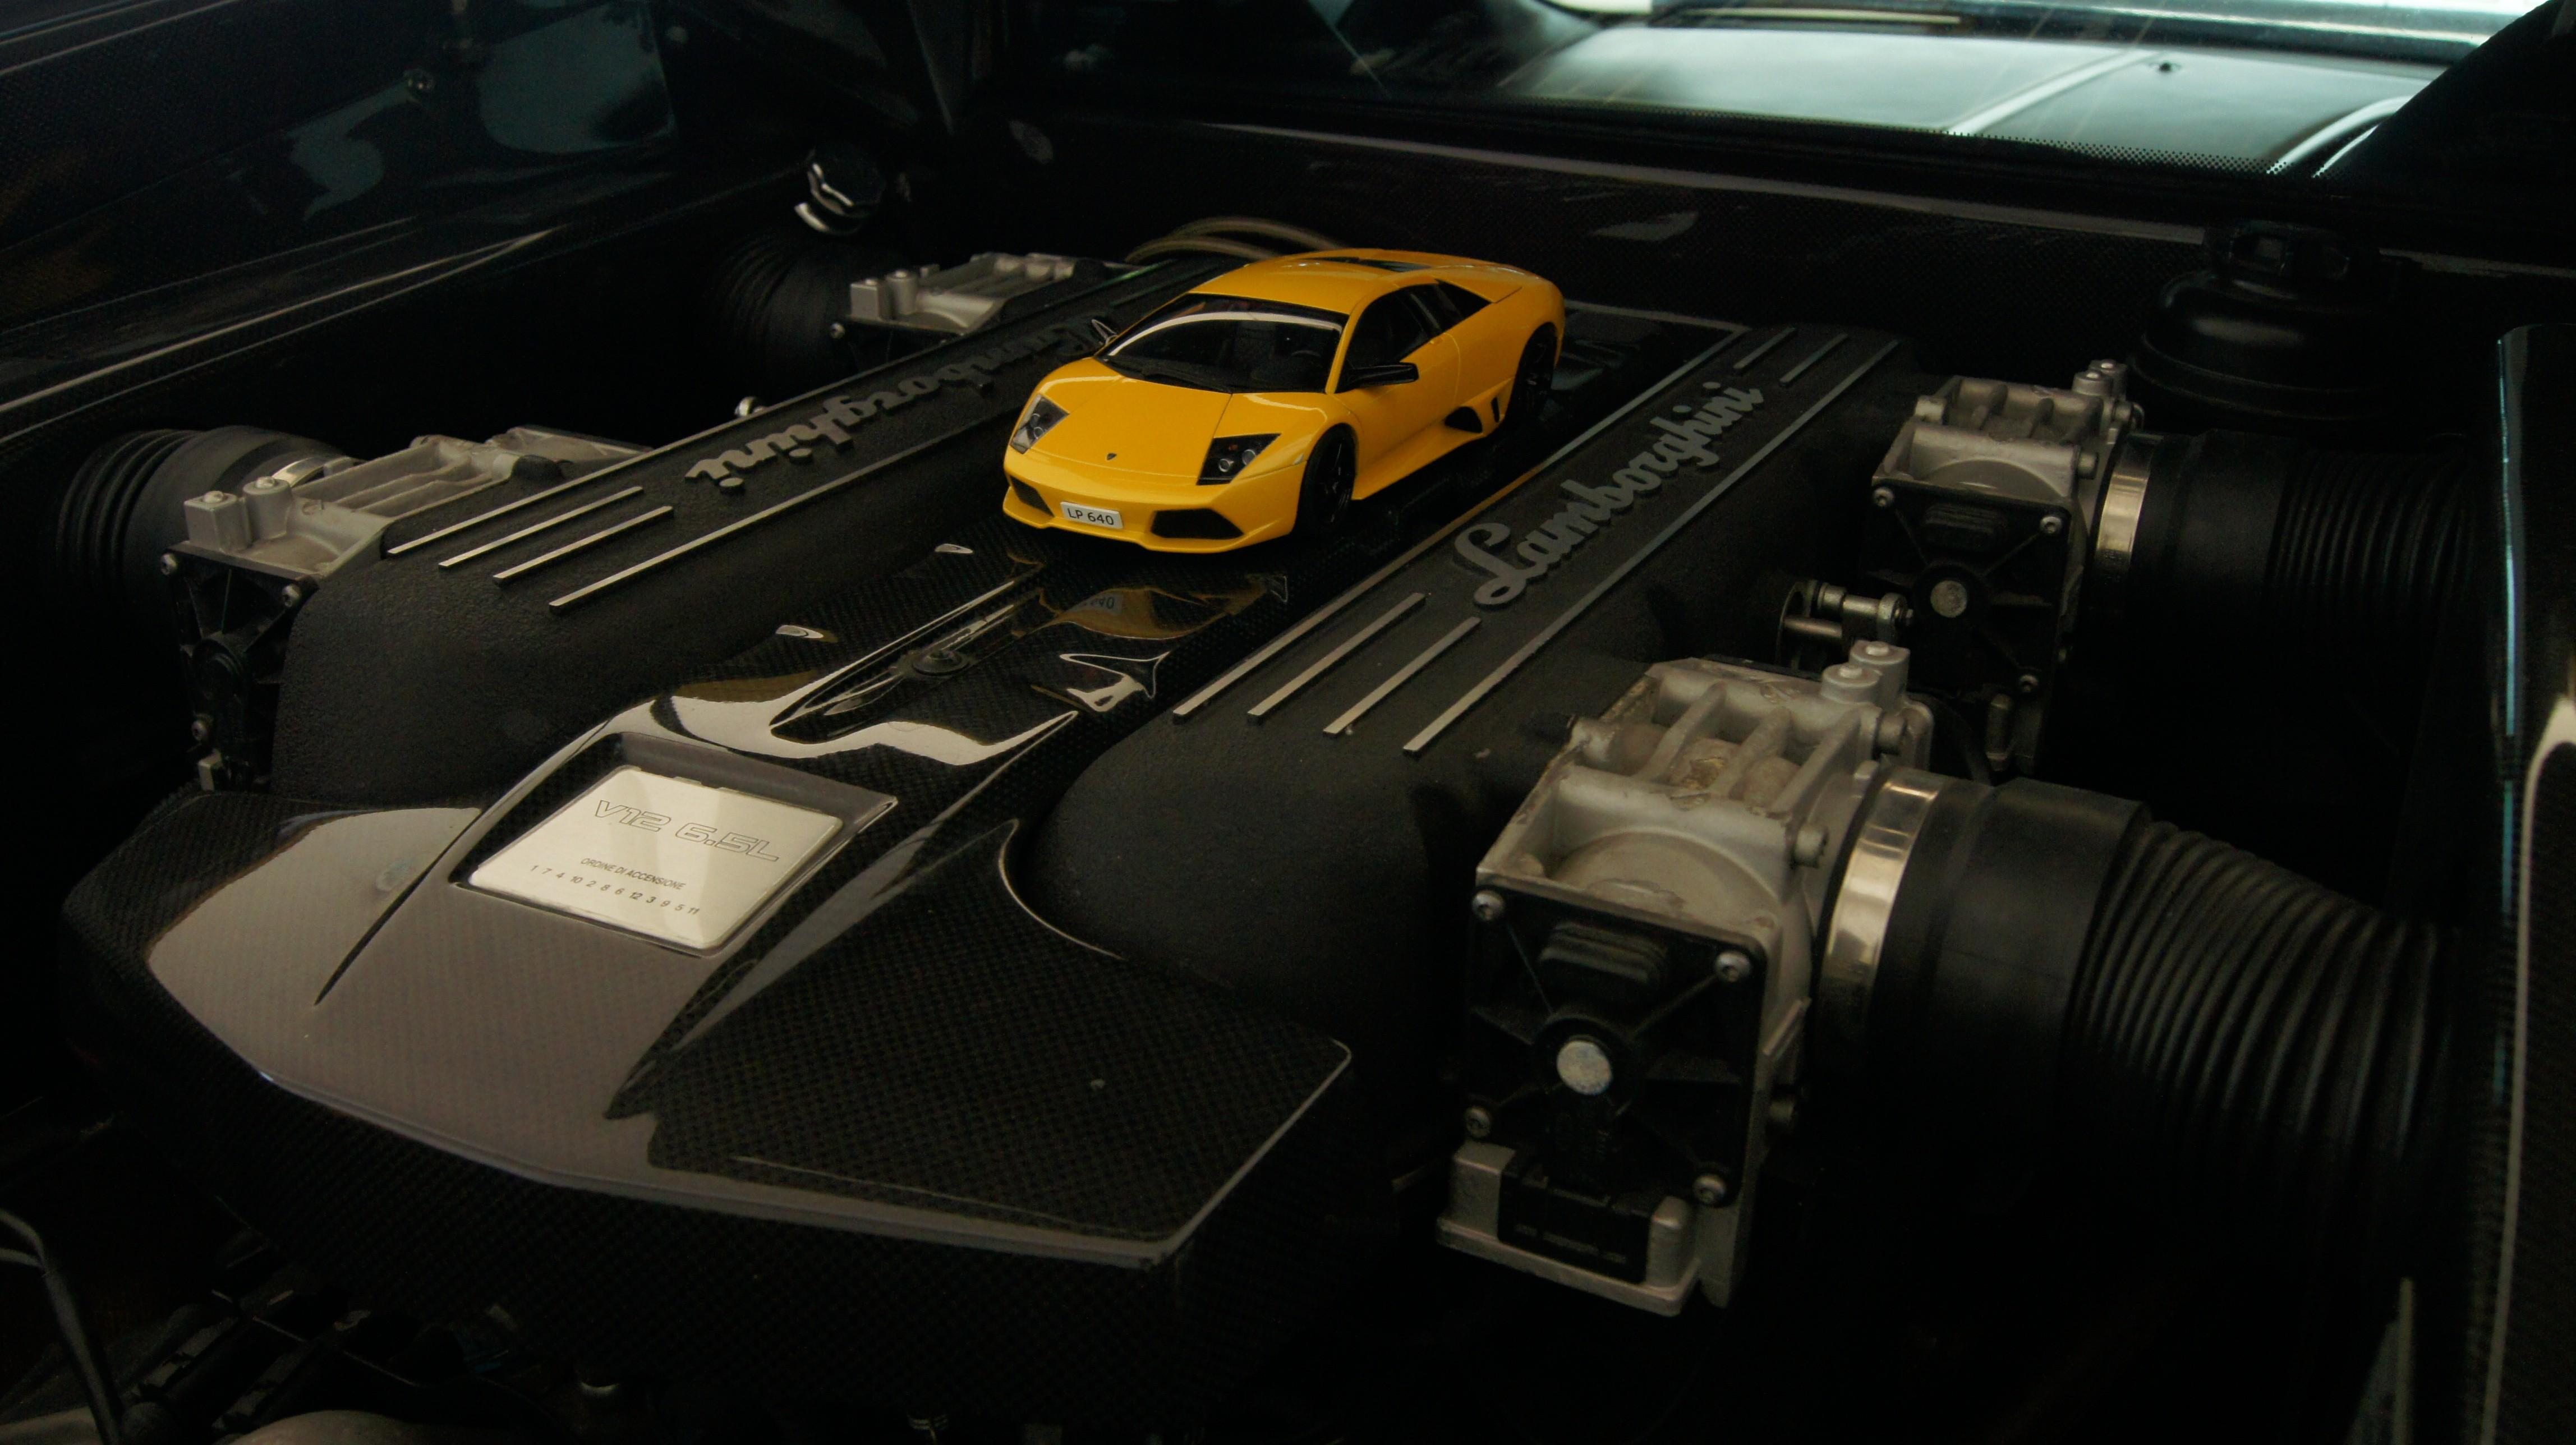 Car Vehicle Engines Sports Lamborghini Murcielago Engine Supercar Land Automobile Make Sport Utility